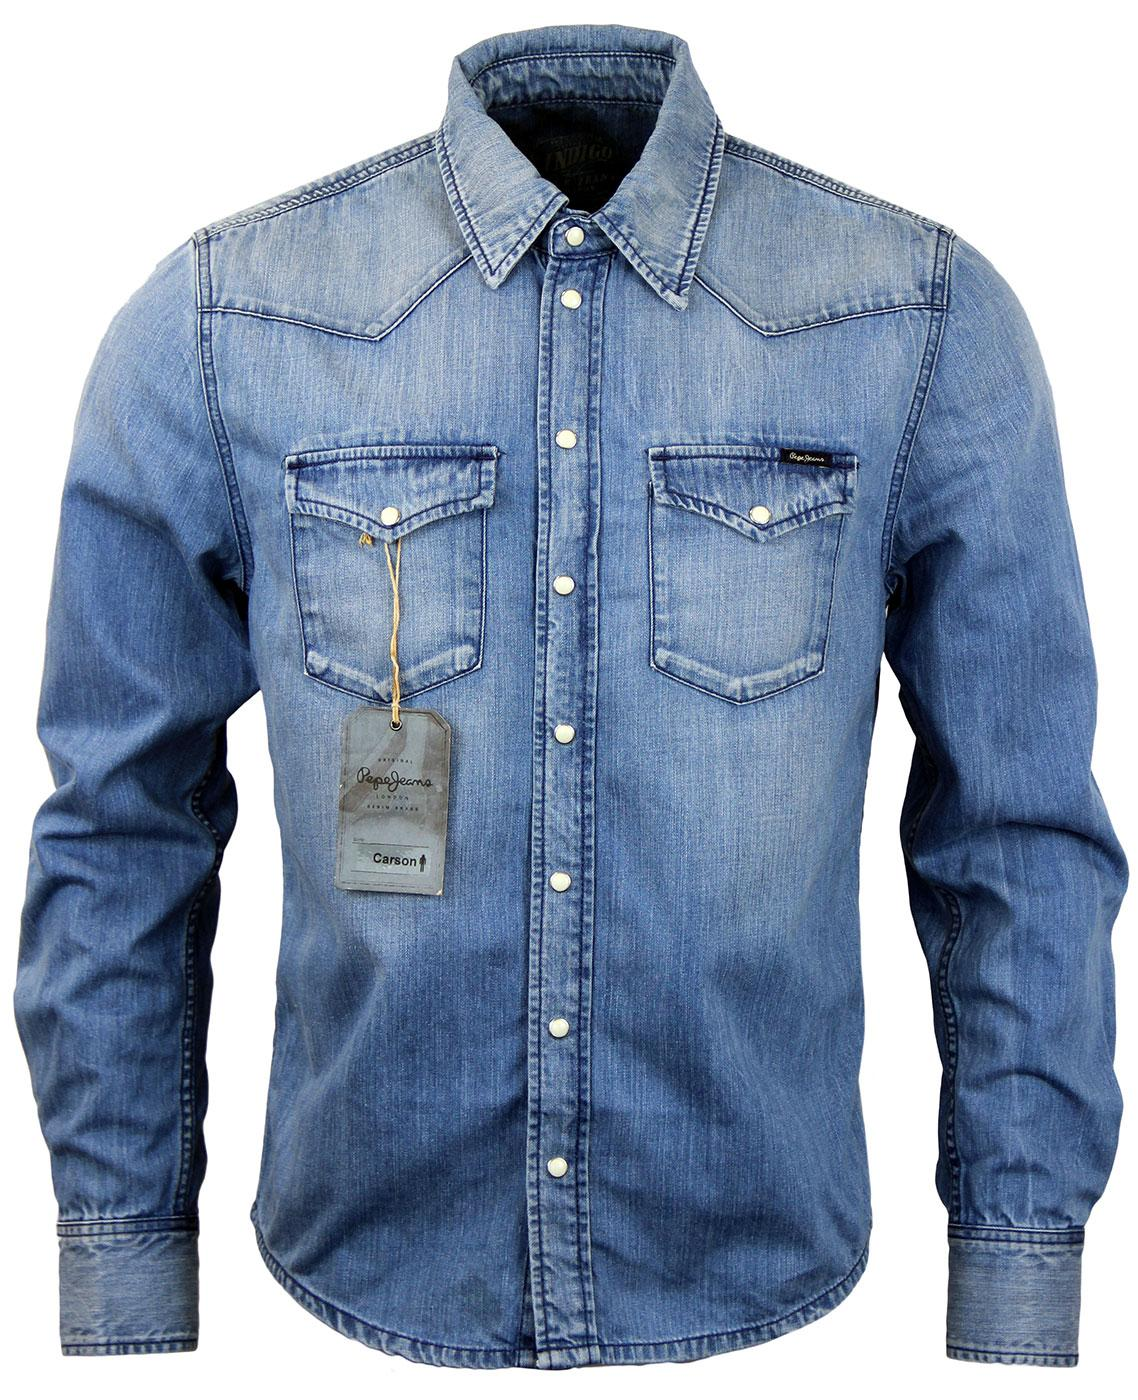 0a37cec7779 Carson PEPE JEANS Retro 70s Light Wash Denim Shirt